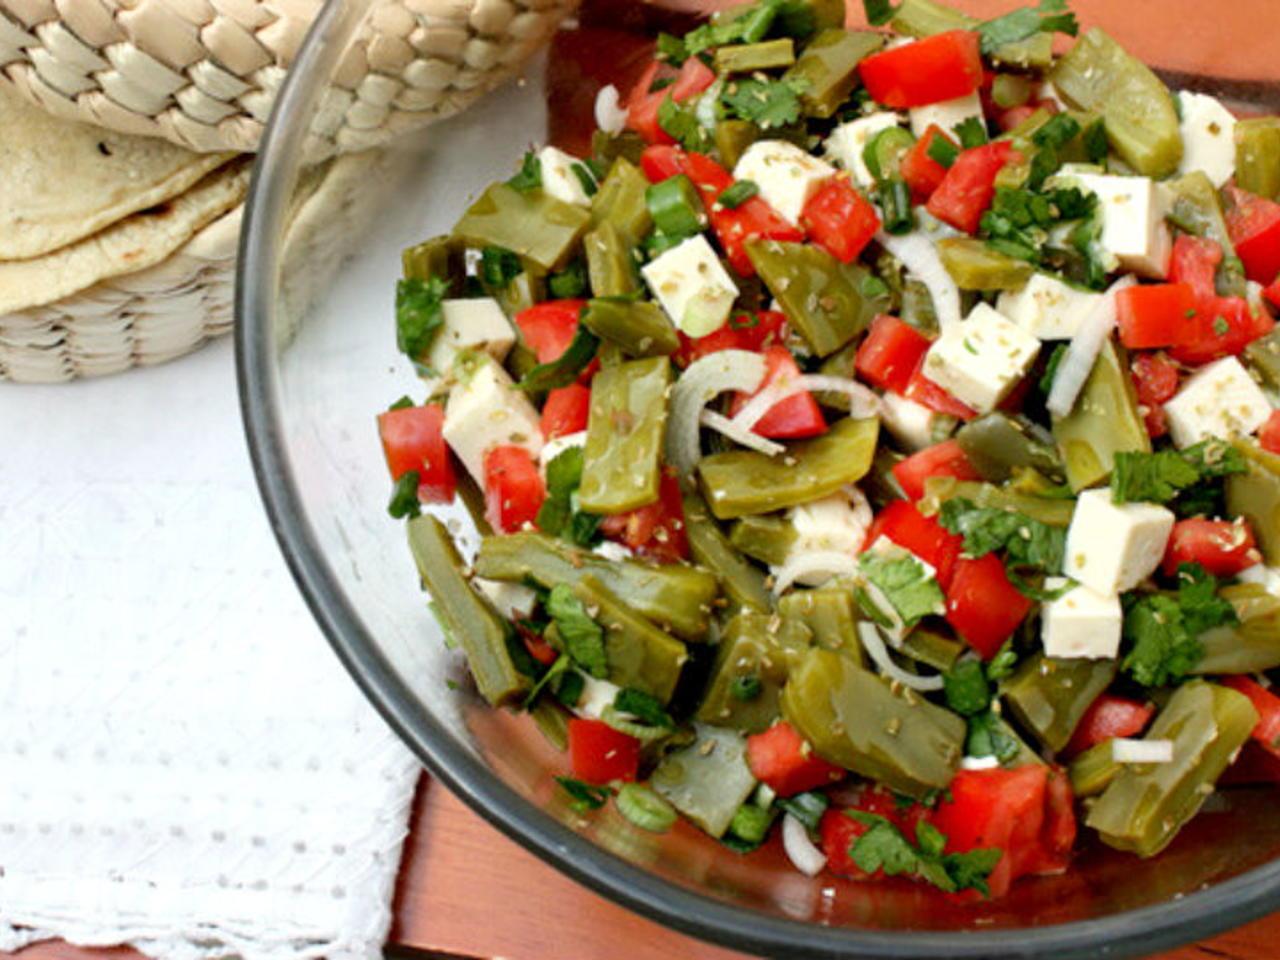 Cactus Leaf Salad